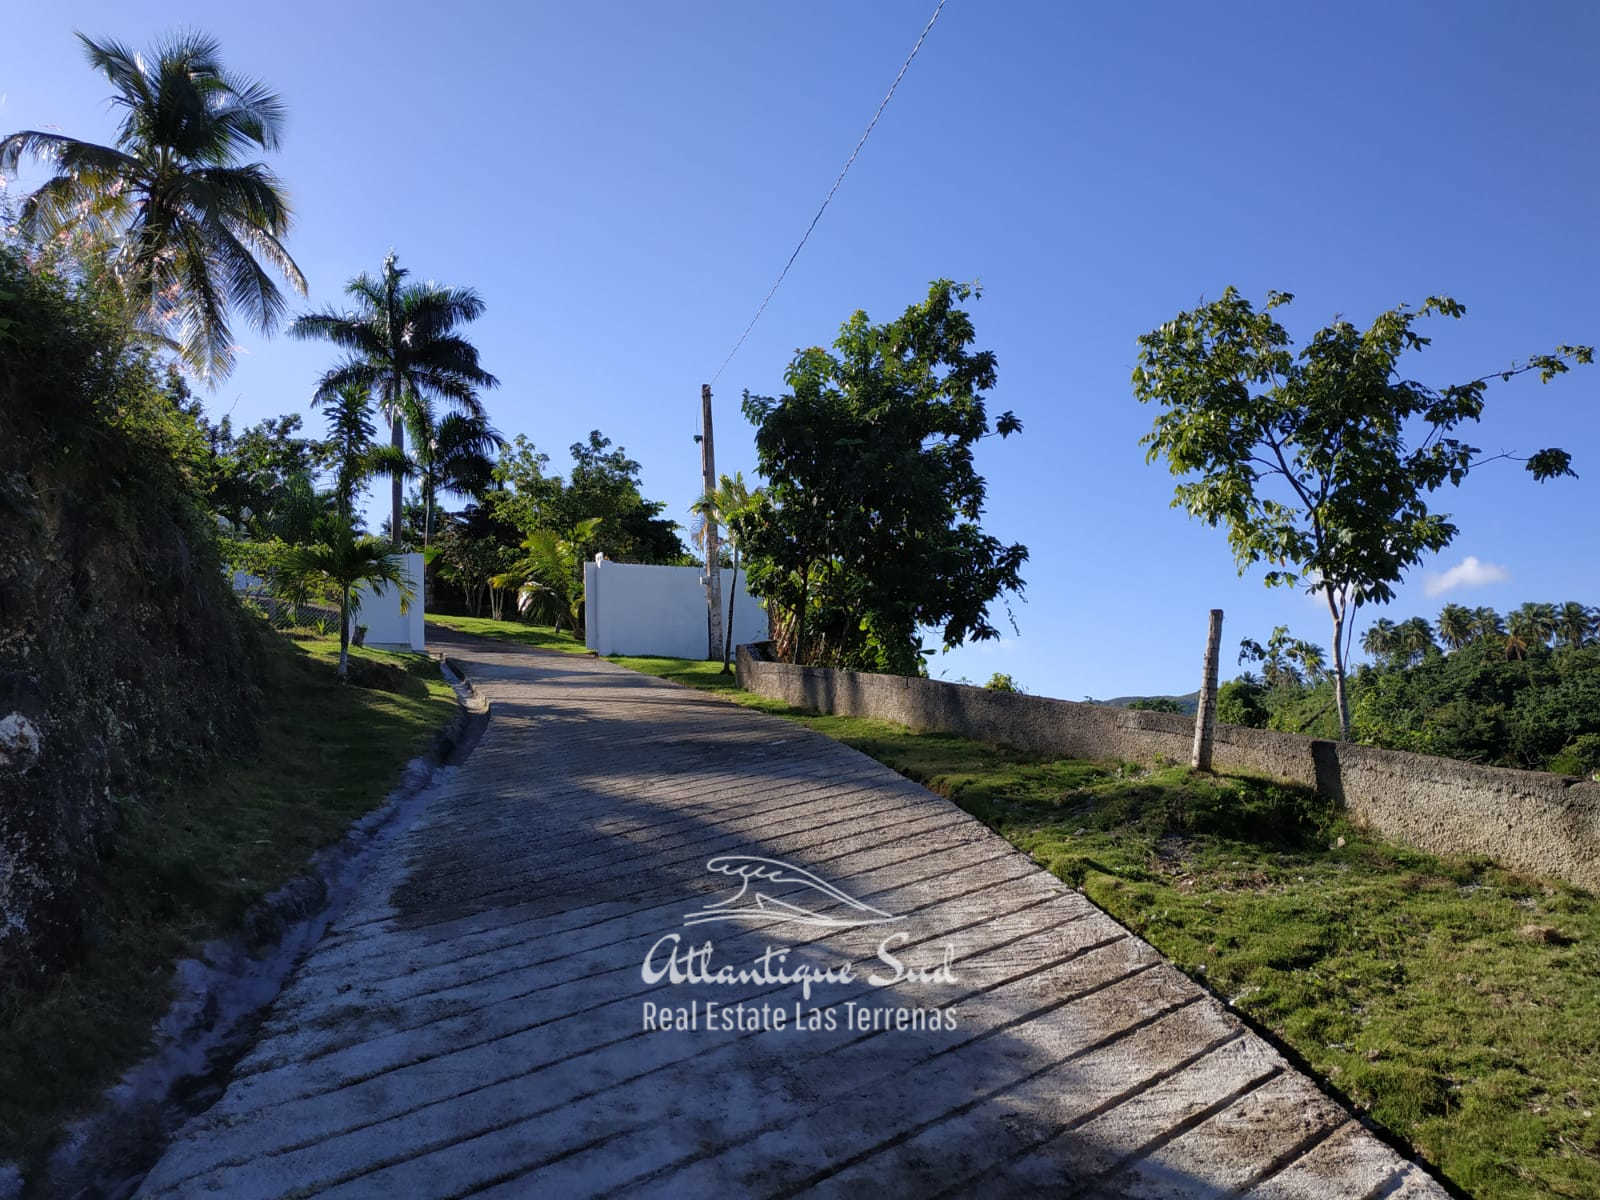 Villa for sale on hill in Las Terrenas Dominican republic1.jpg